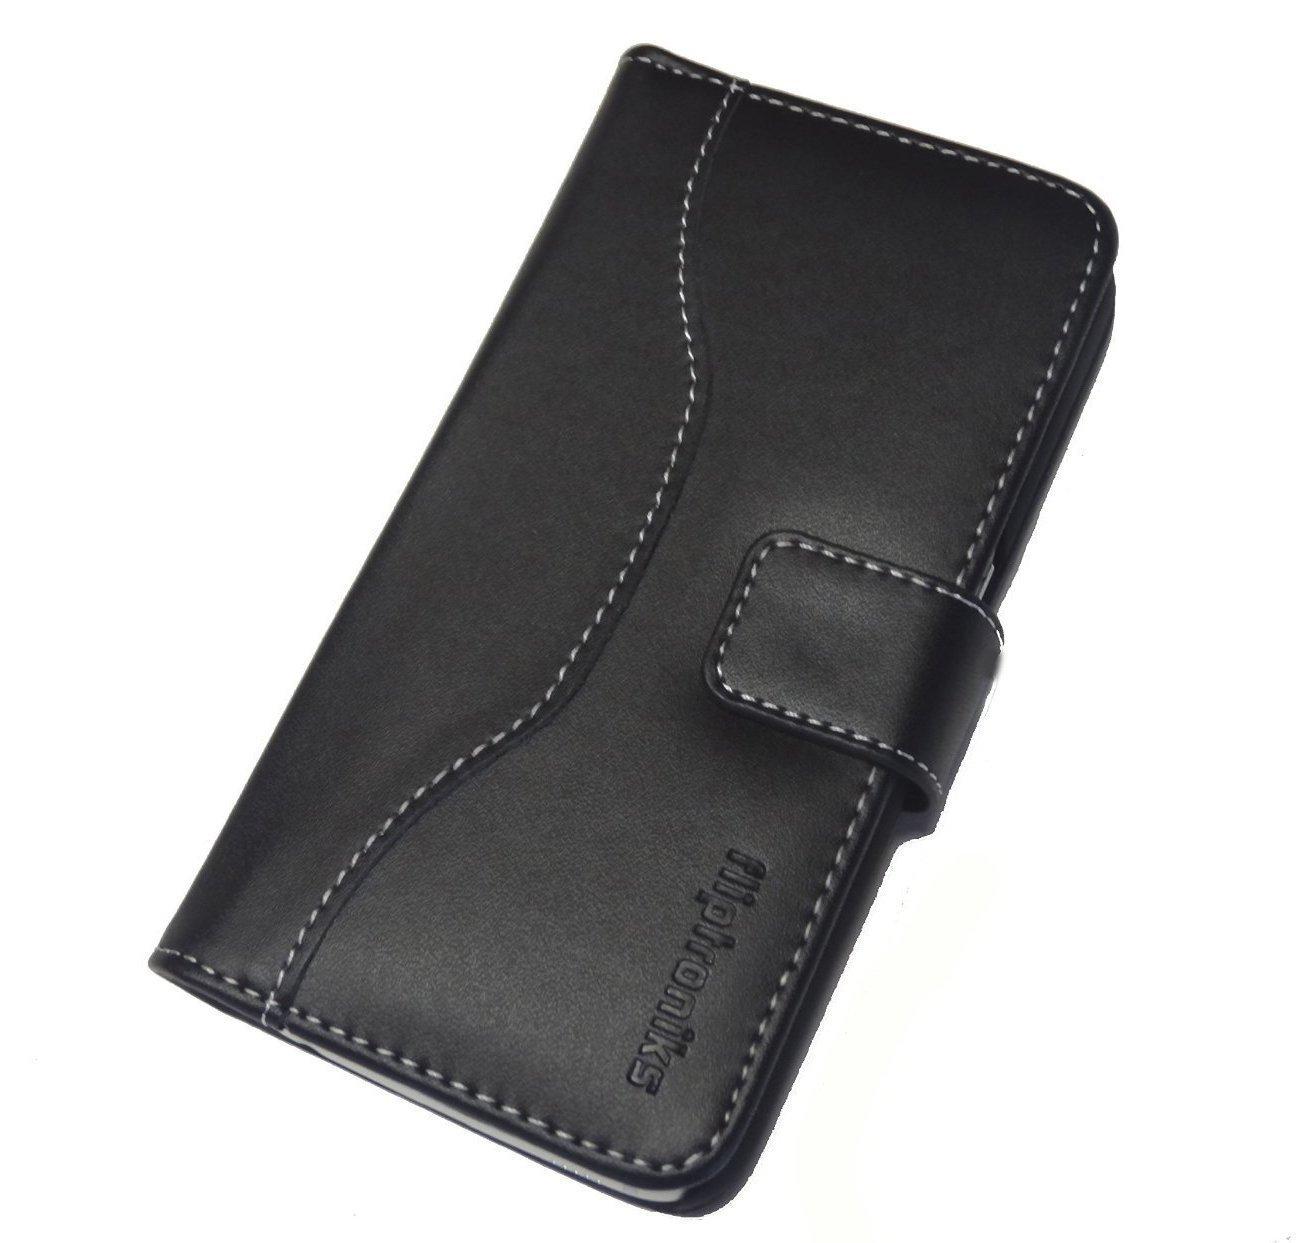 Fliptroniks Samsung Galaxy S6 Black Flip Case Top 3 Benefits